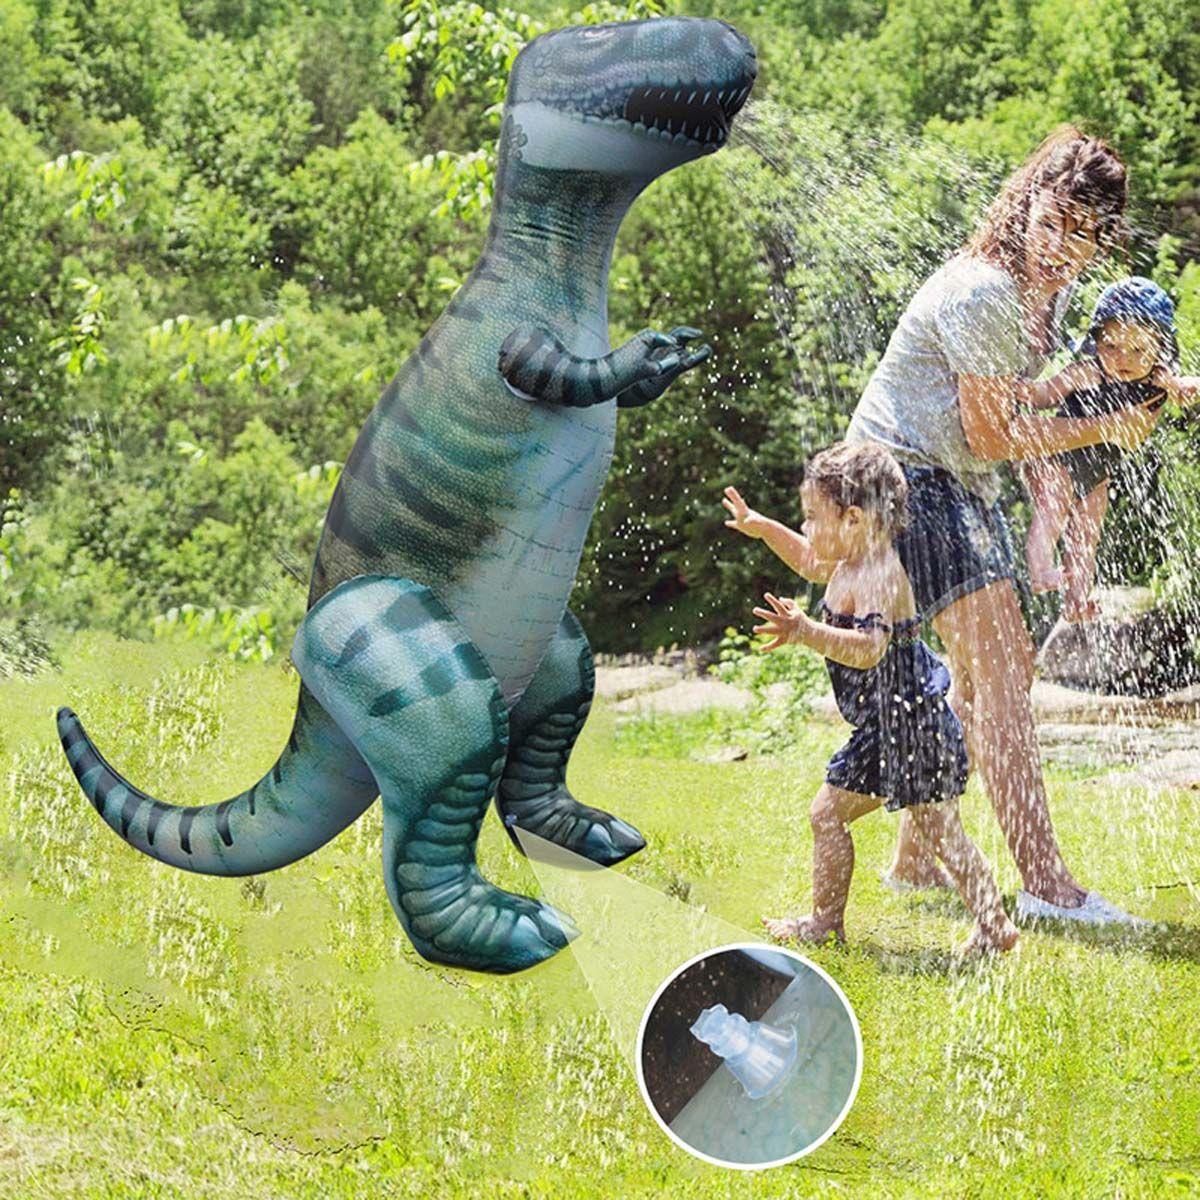 180cm Summer Inflatable Water Sprayer Toys Kids Water Splash Play Toy Water Jet Dinosaur Model Yard Outdoor Fun PVC Material